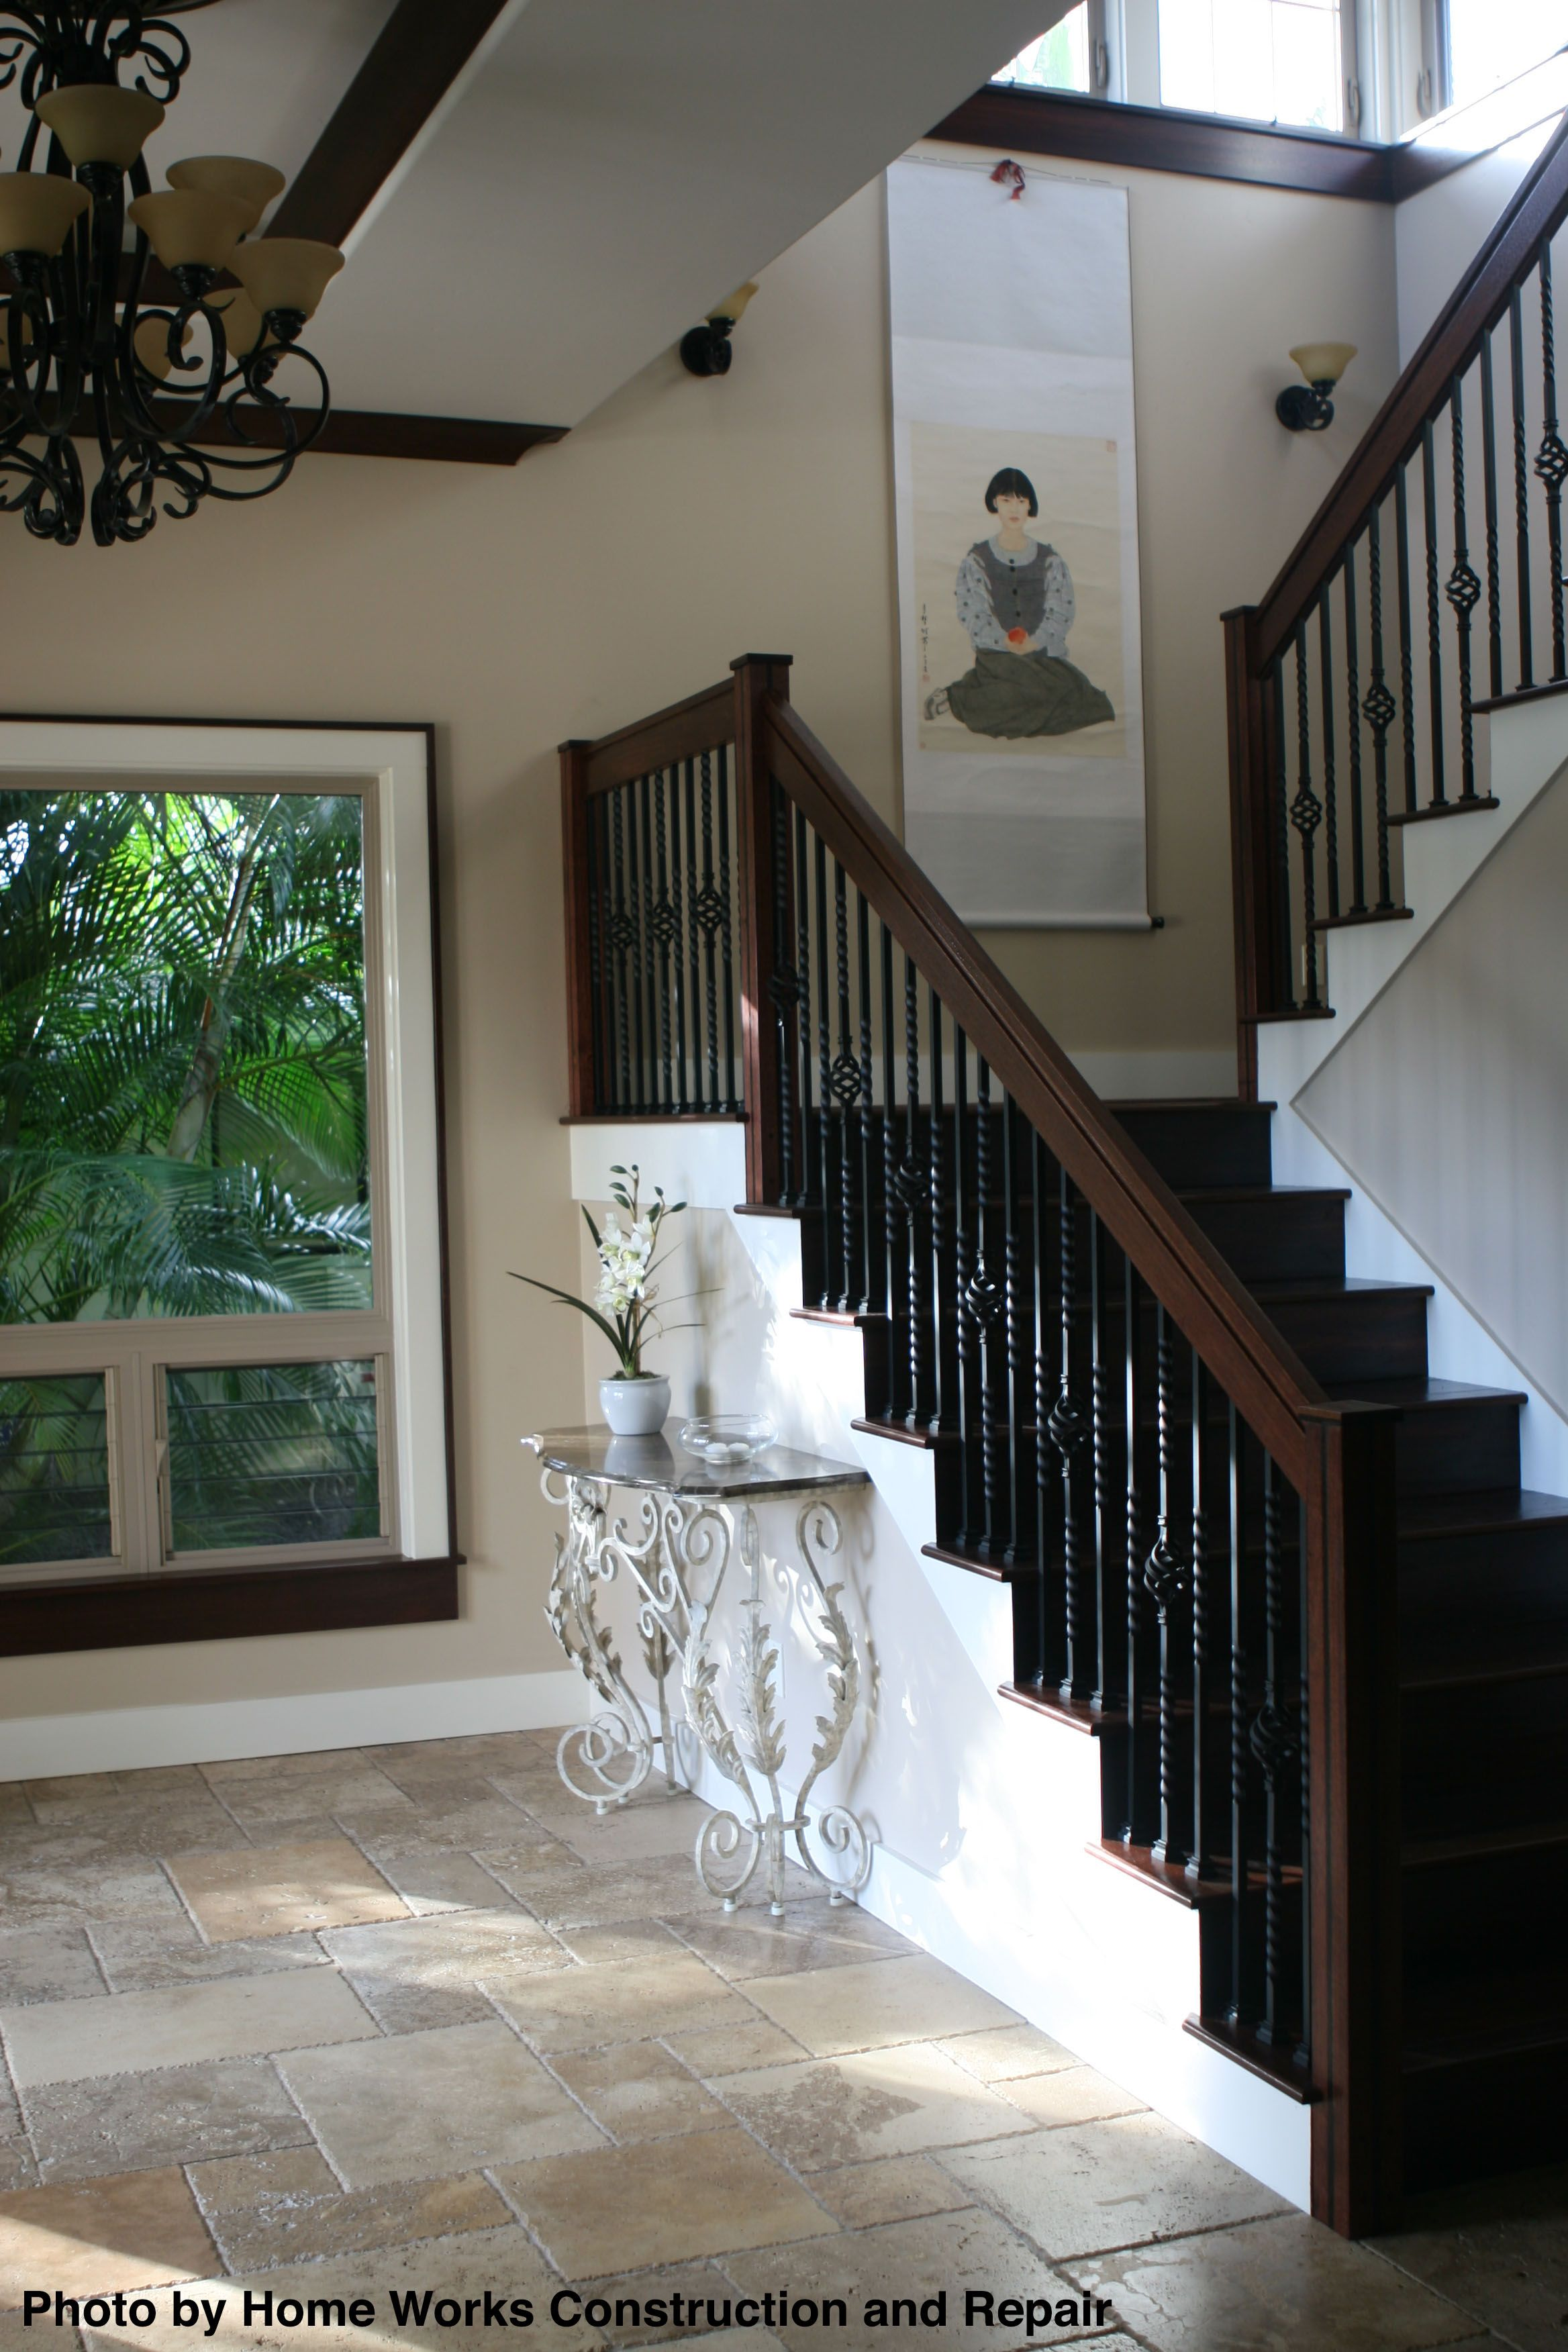 Best Diy Tips For How To Fix Loose Or Broken Ceramic Floor Tiles Stone Tile Flooring Wood Stairs 640 x 480